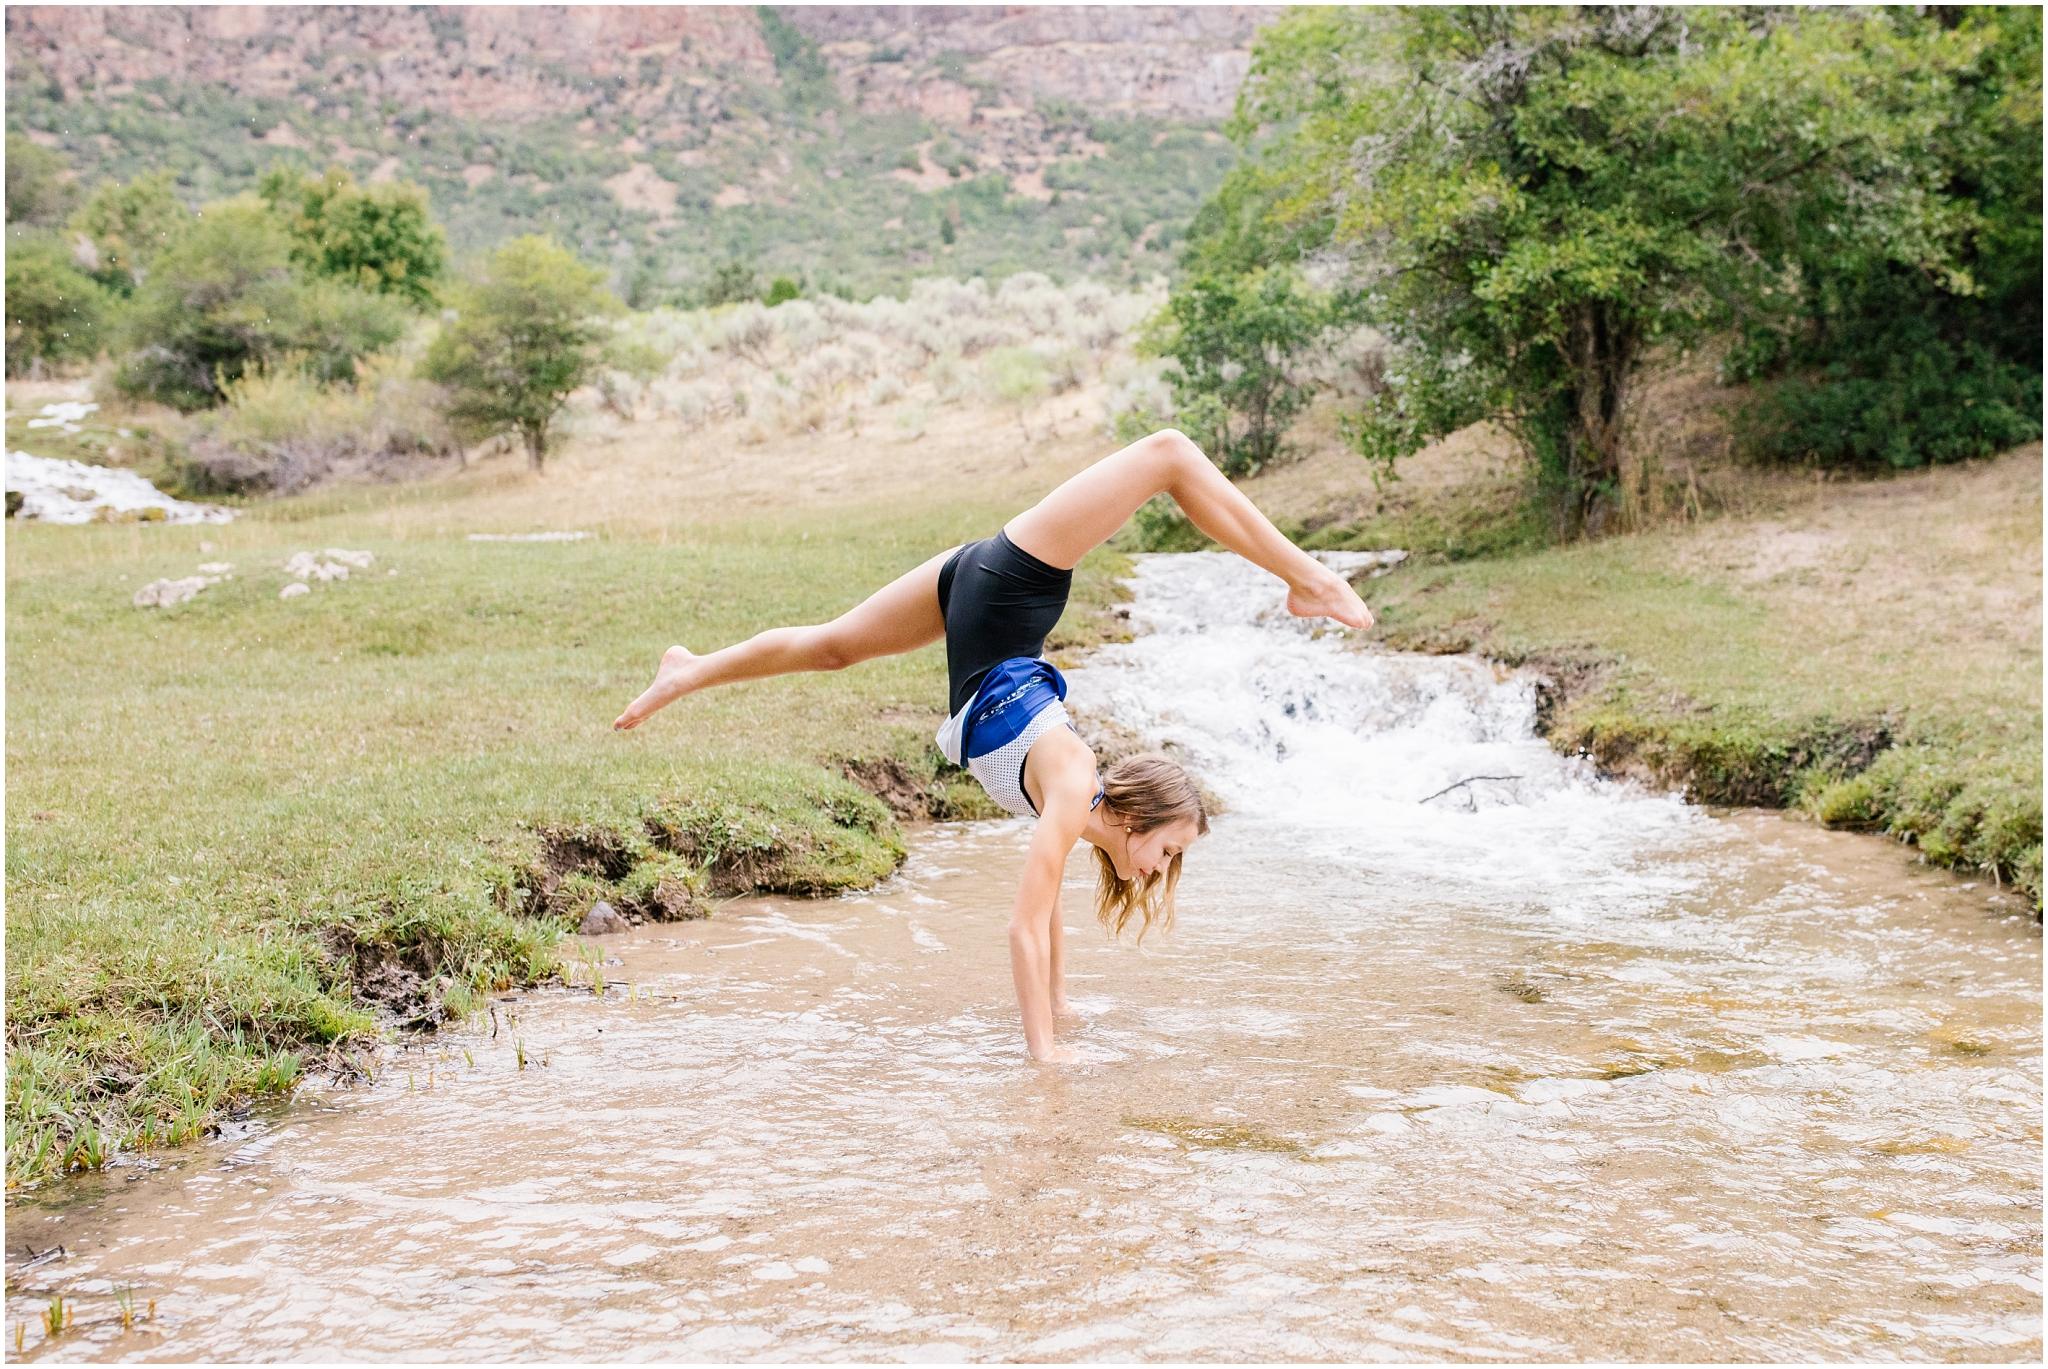 GVHSDRILL-36_Lizzie-B-Imagery-Utah-Family-Photographer-Central-Utah-Park-City-Salt-Lake-City-Drill-Team-Photography-Dance.jpg